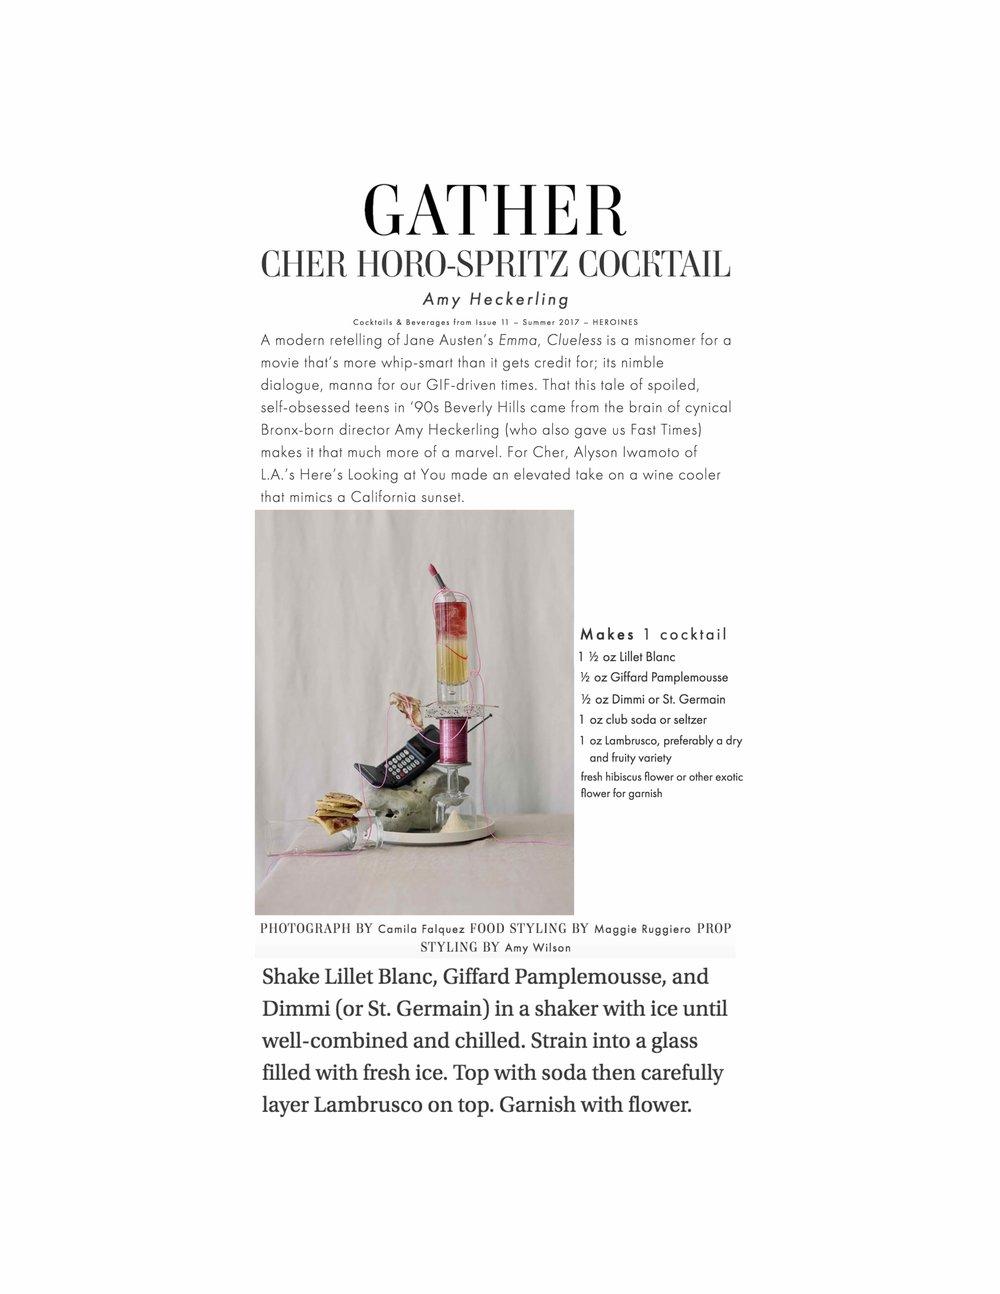 Gather_052517.jpg